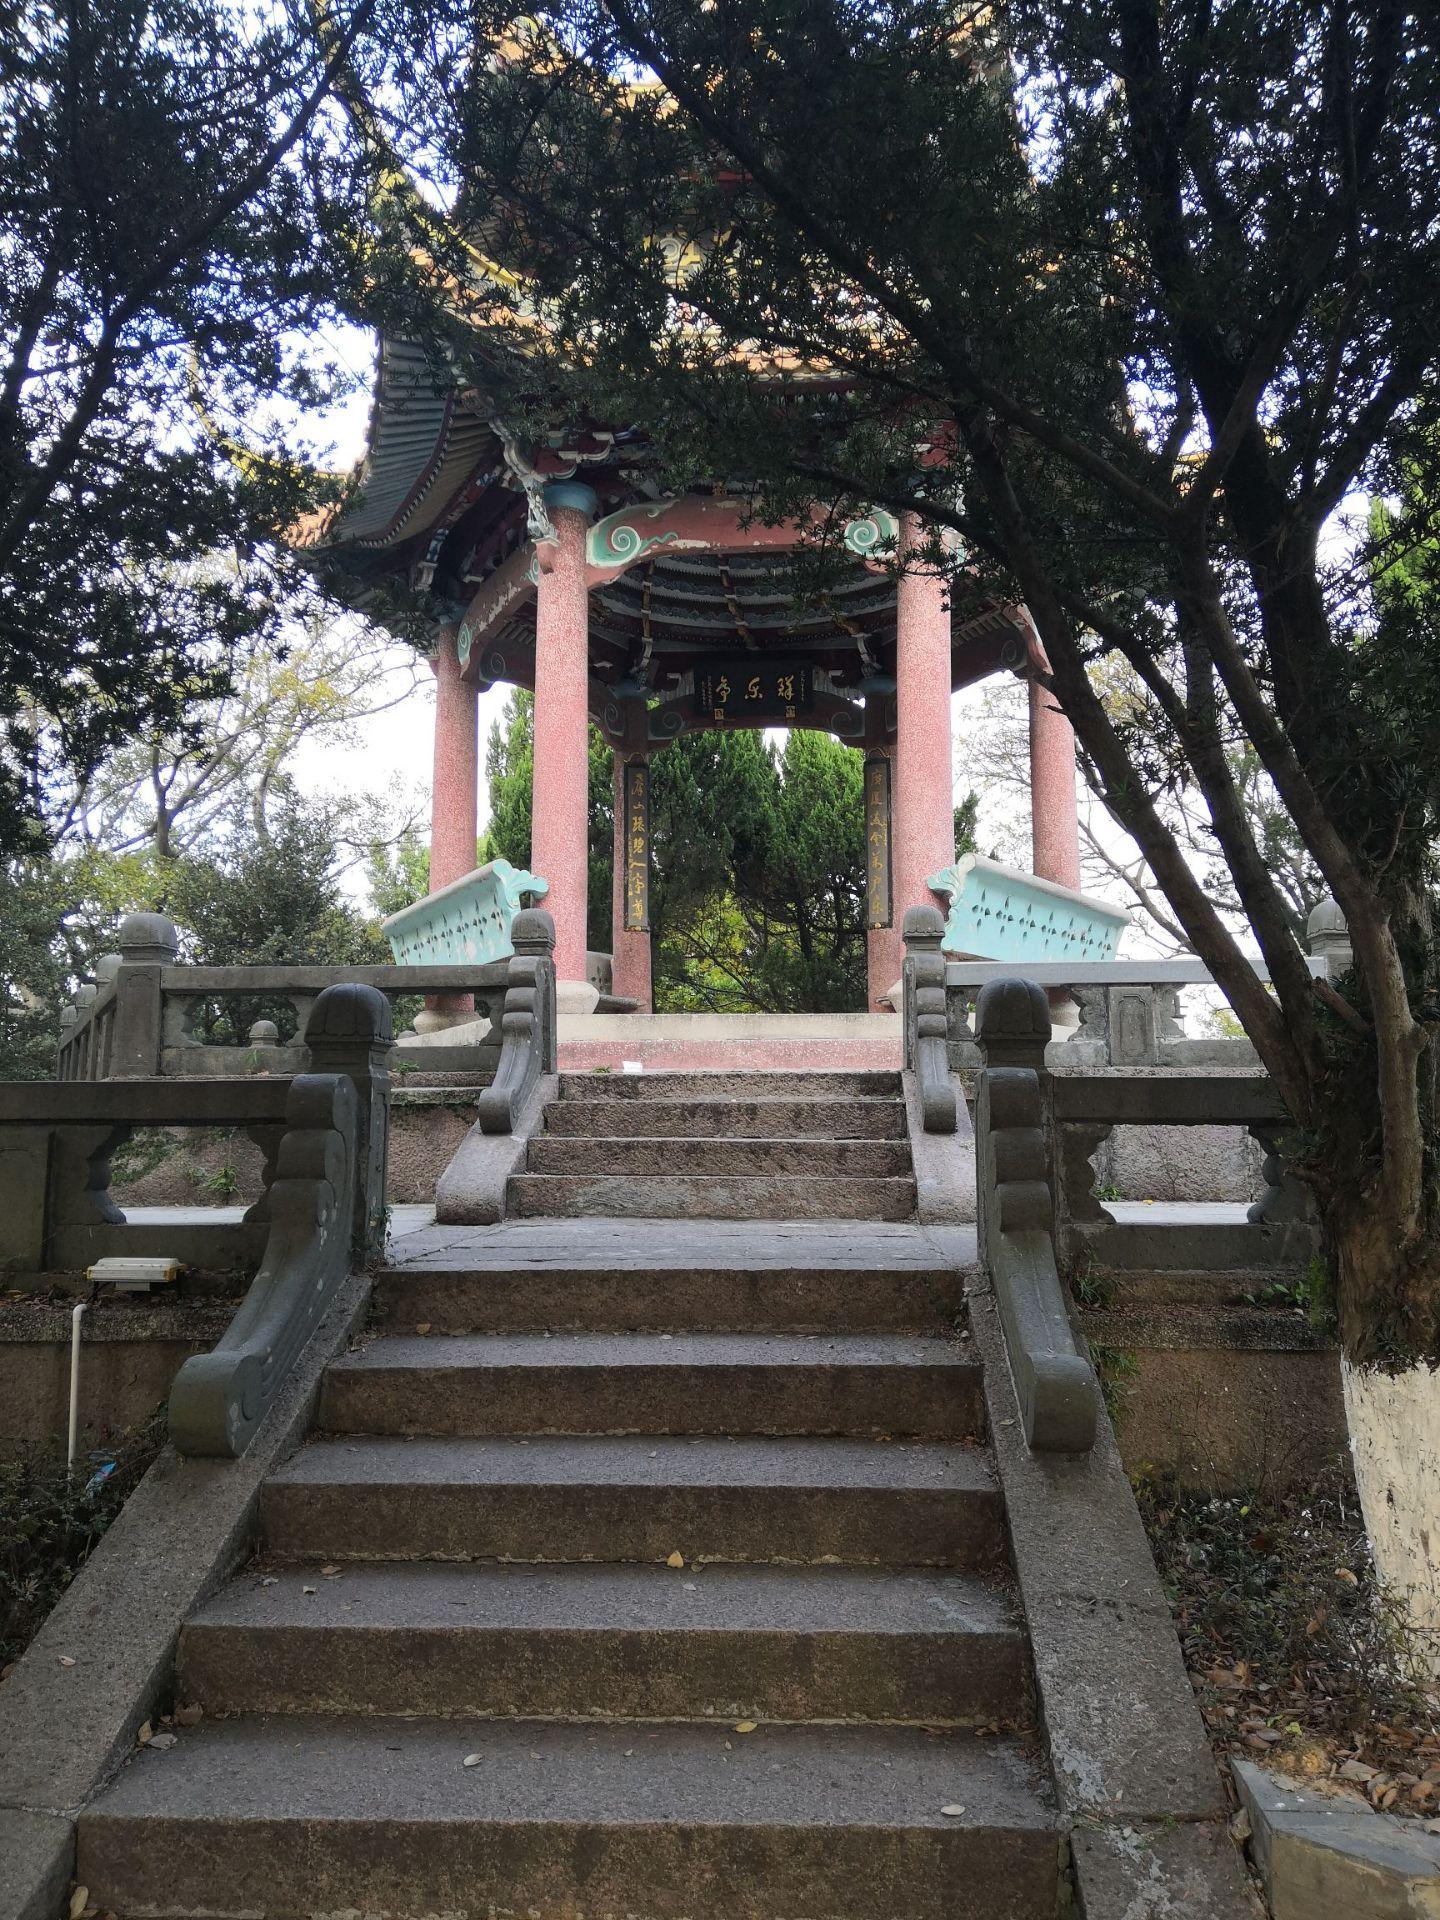 Qiu Mountain Park